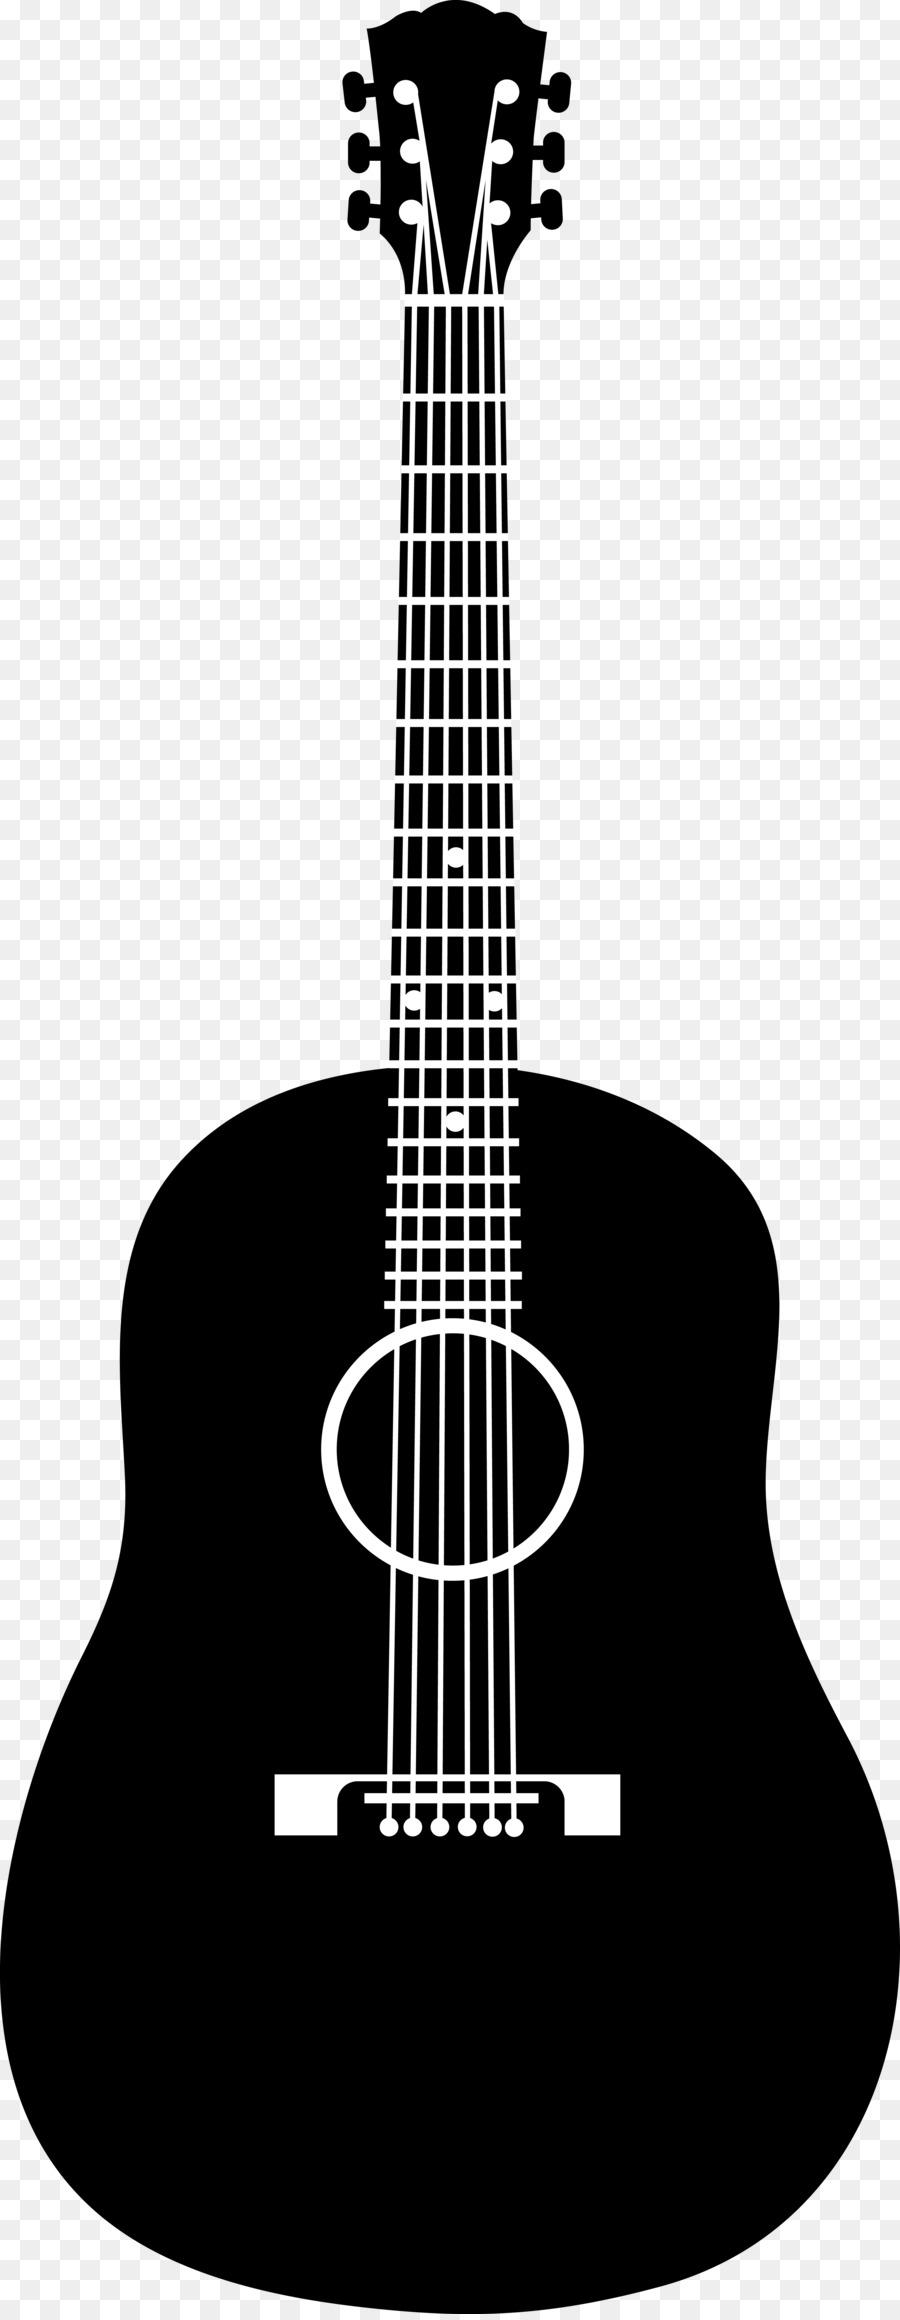 900x2320 Drawings Of Acoustic Guitars